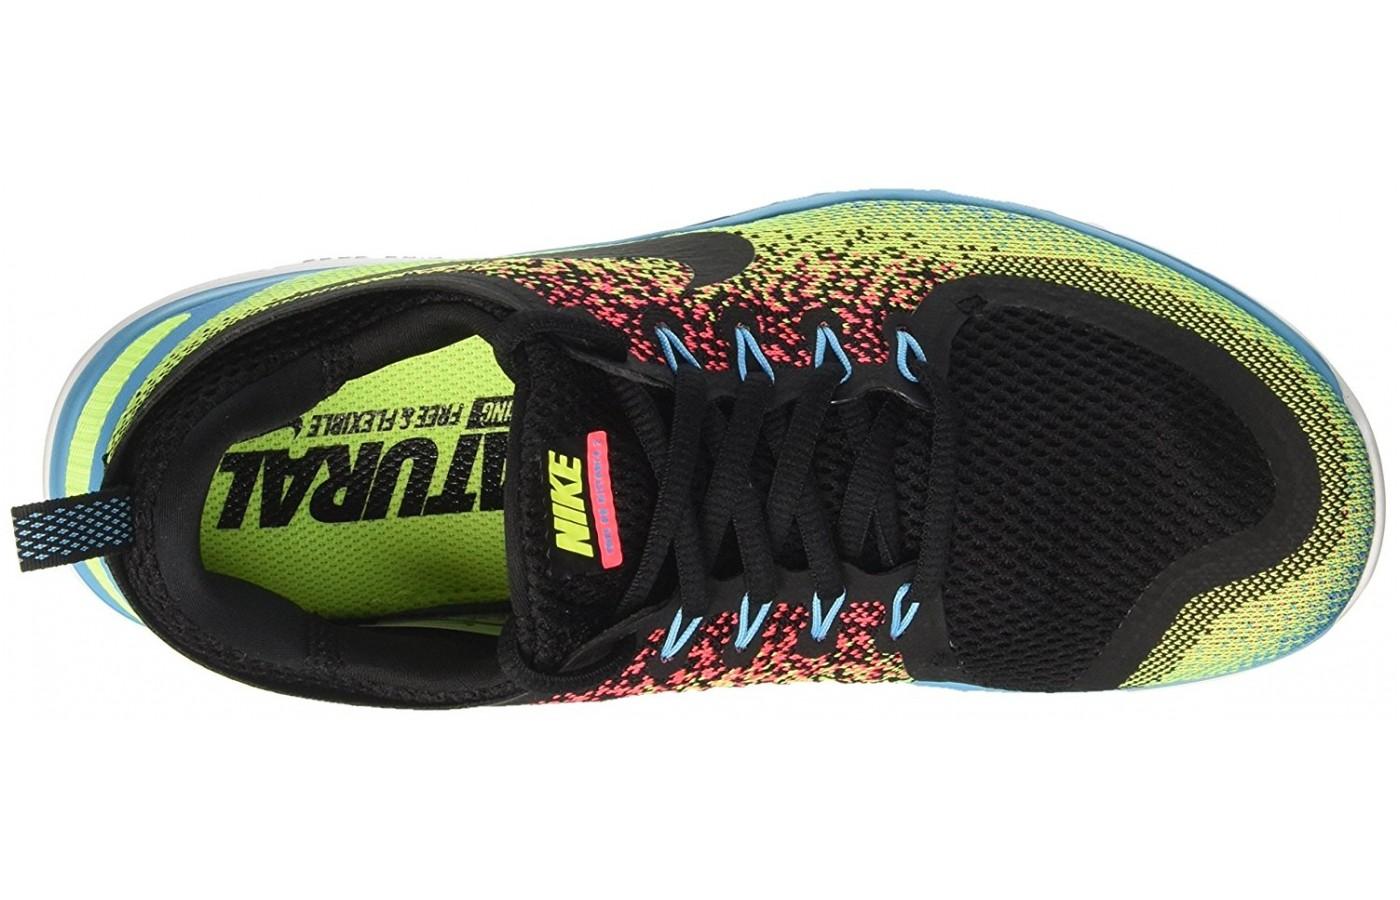 Nike Free RN Distance 2 upper